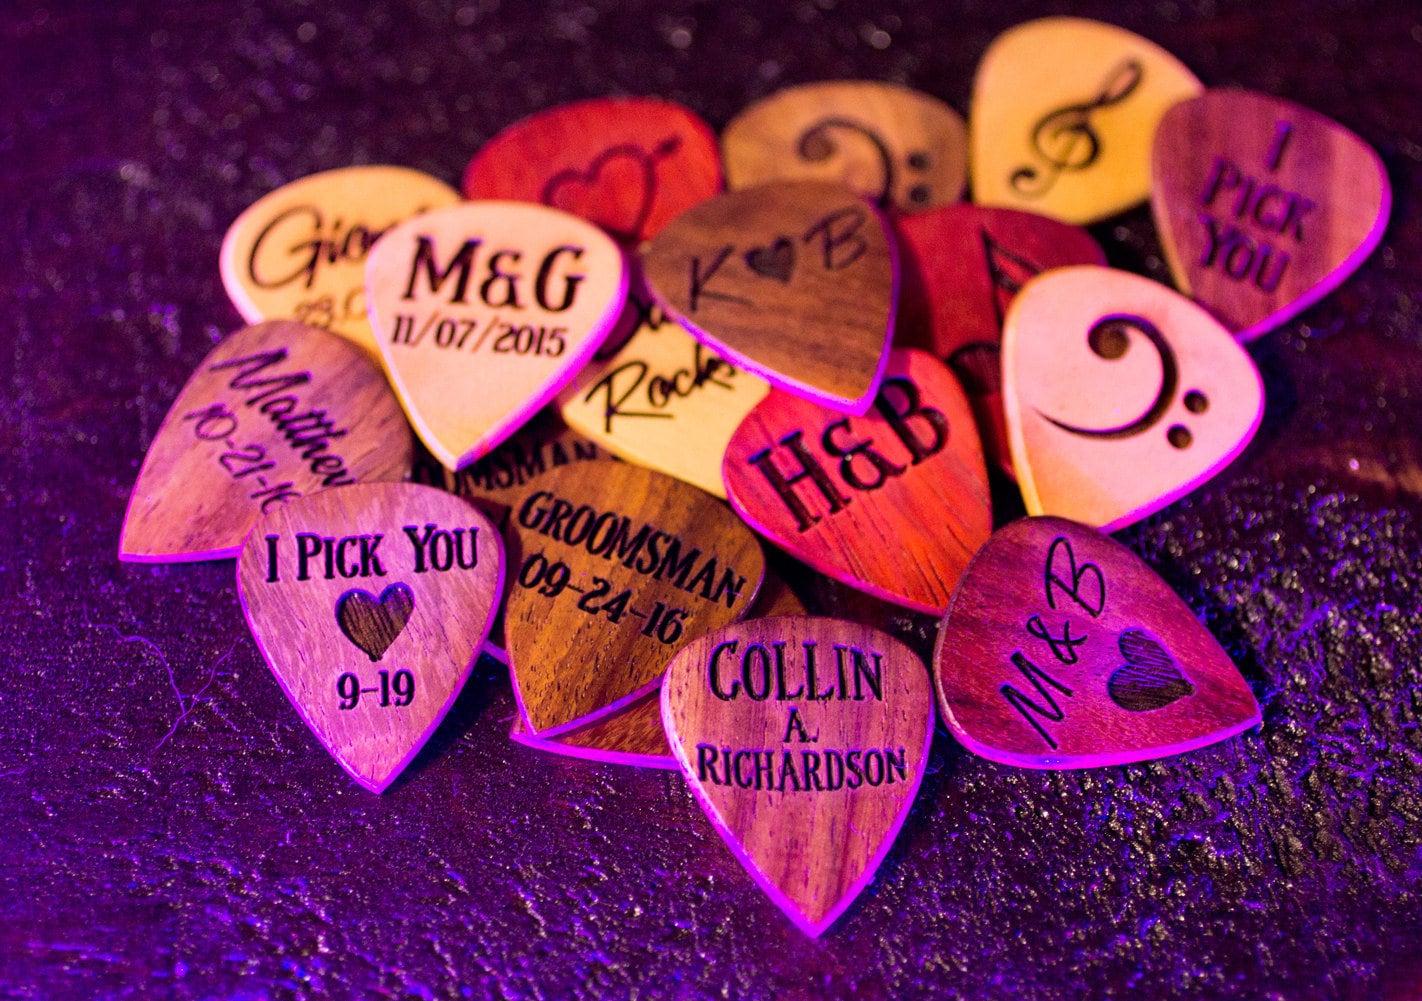 Free Shipping Personalized Guitar Picks Custom Guitar Pick image 4